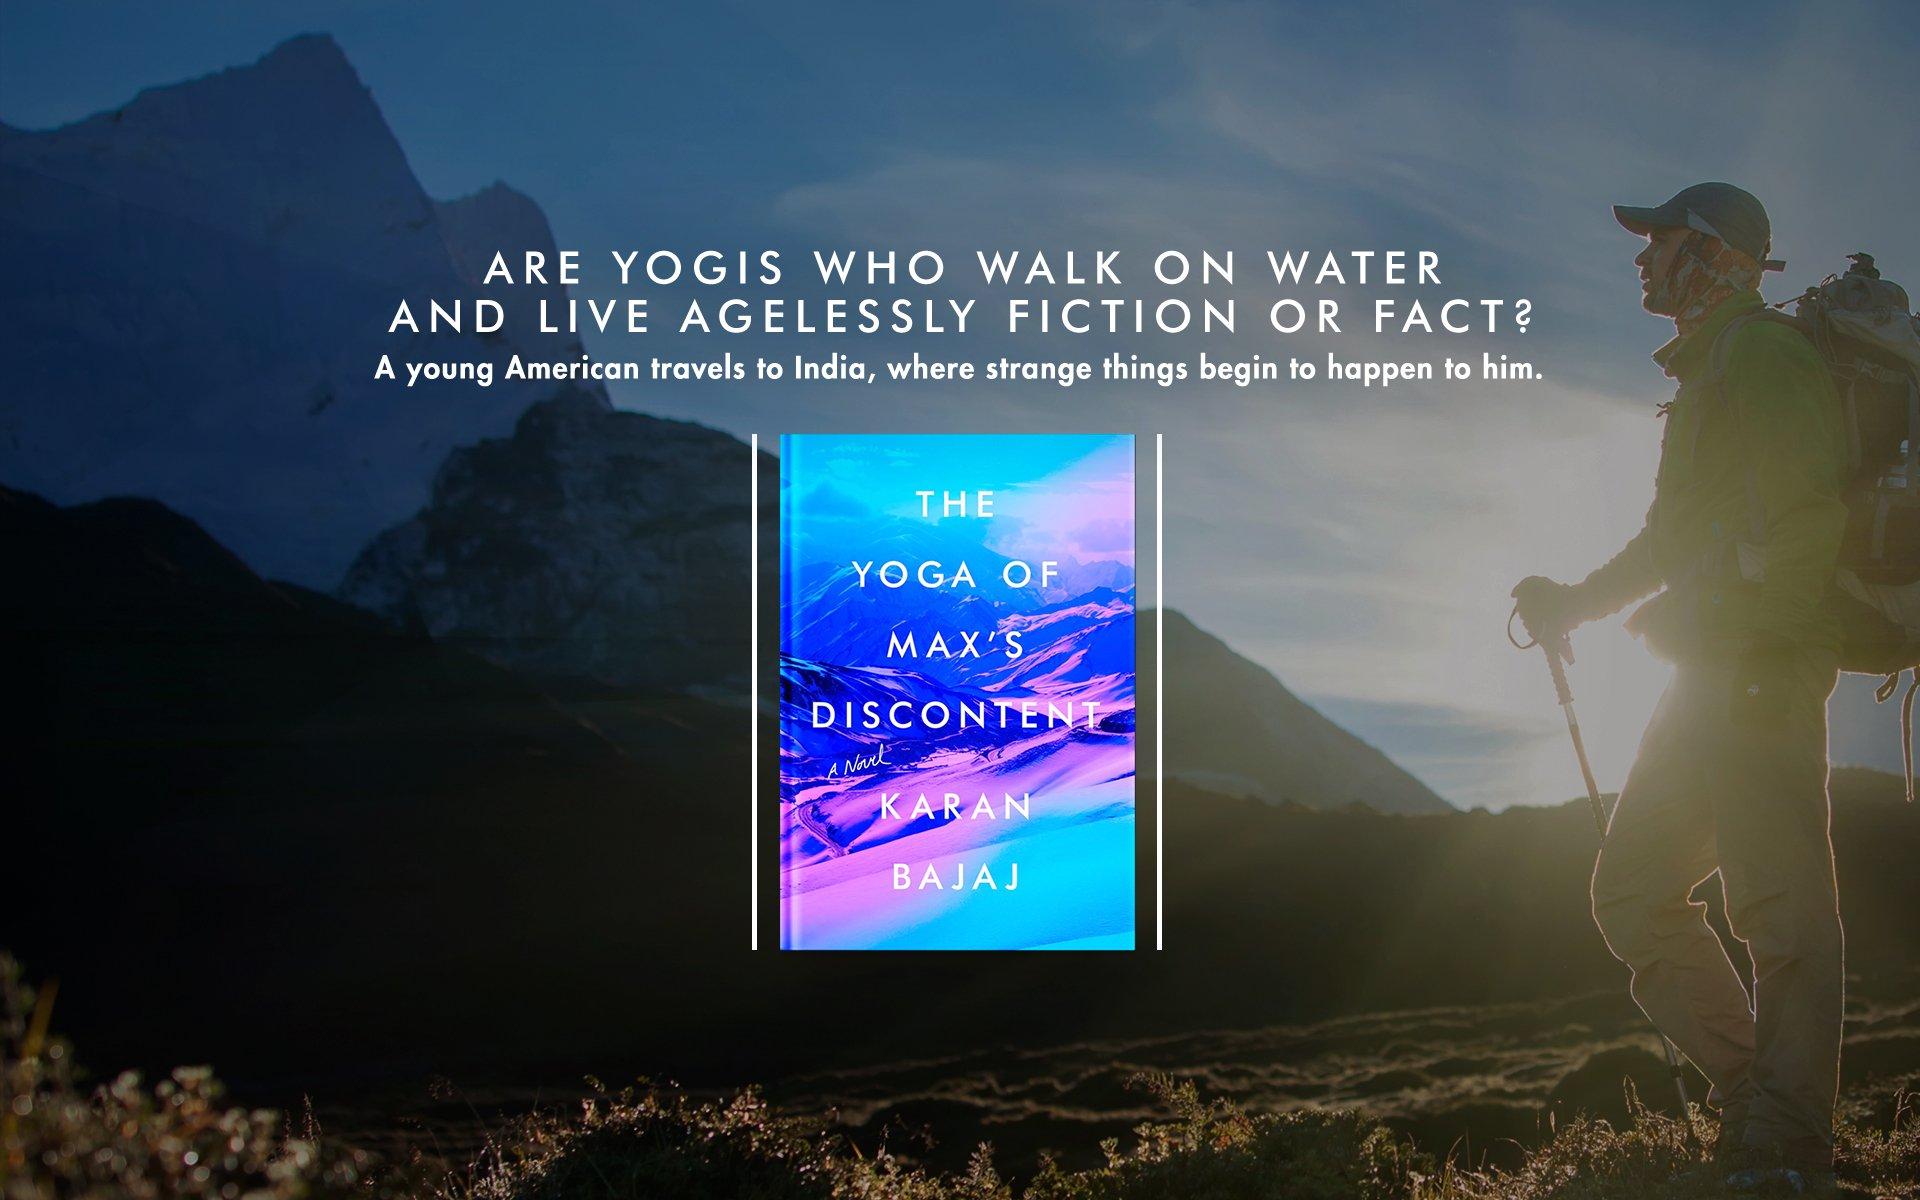 Amazon: The Yoga Of Max's Discontent: A Novel (9781594634116): Karan  Bajaj: Books